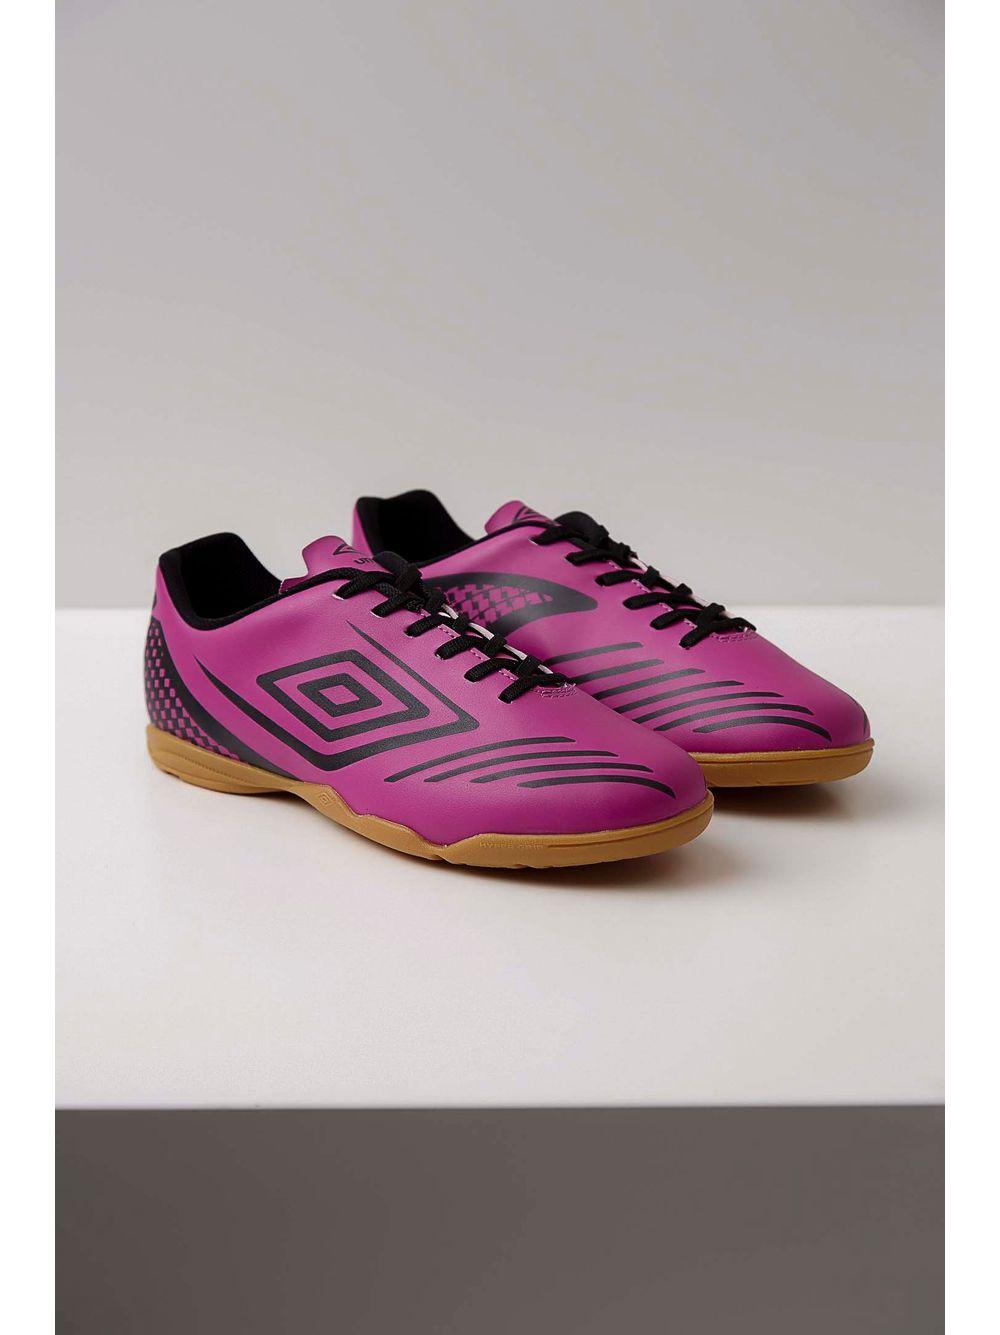 Chuteira Futsal Umbro 0f72095 Pink - pittol 0d488305e1e75